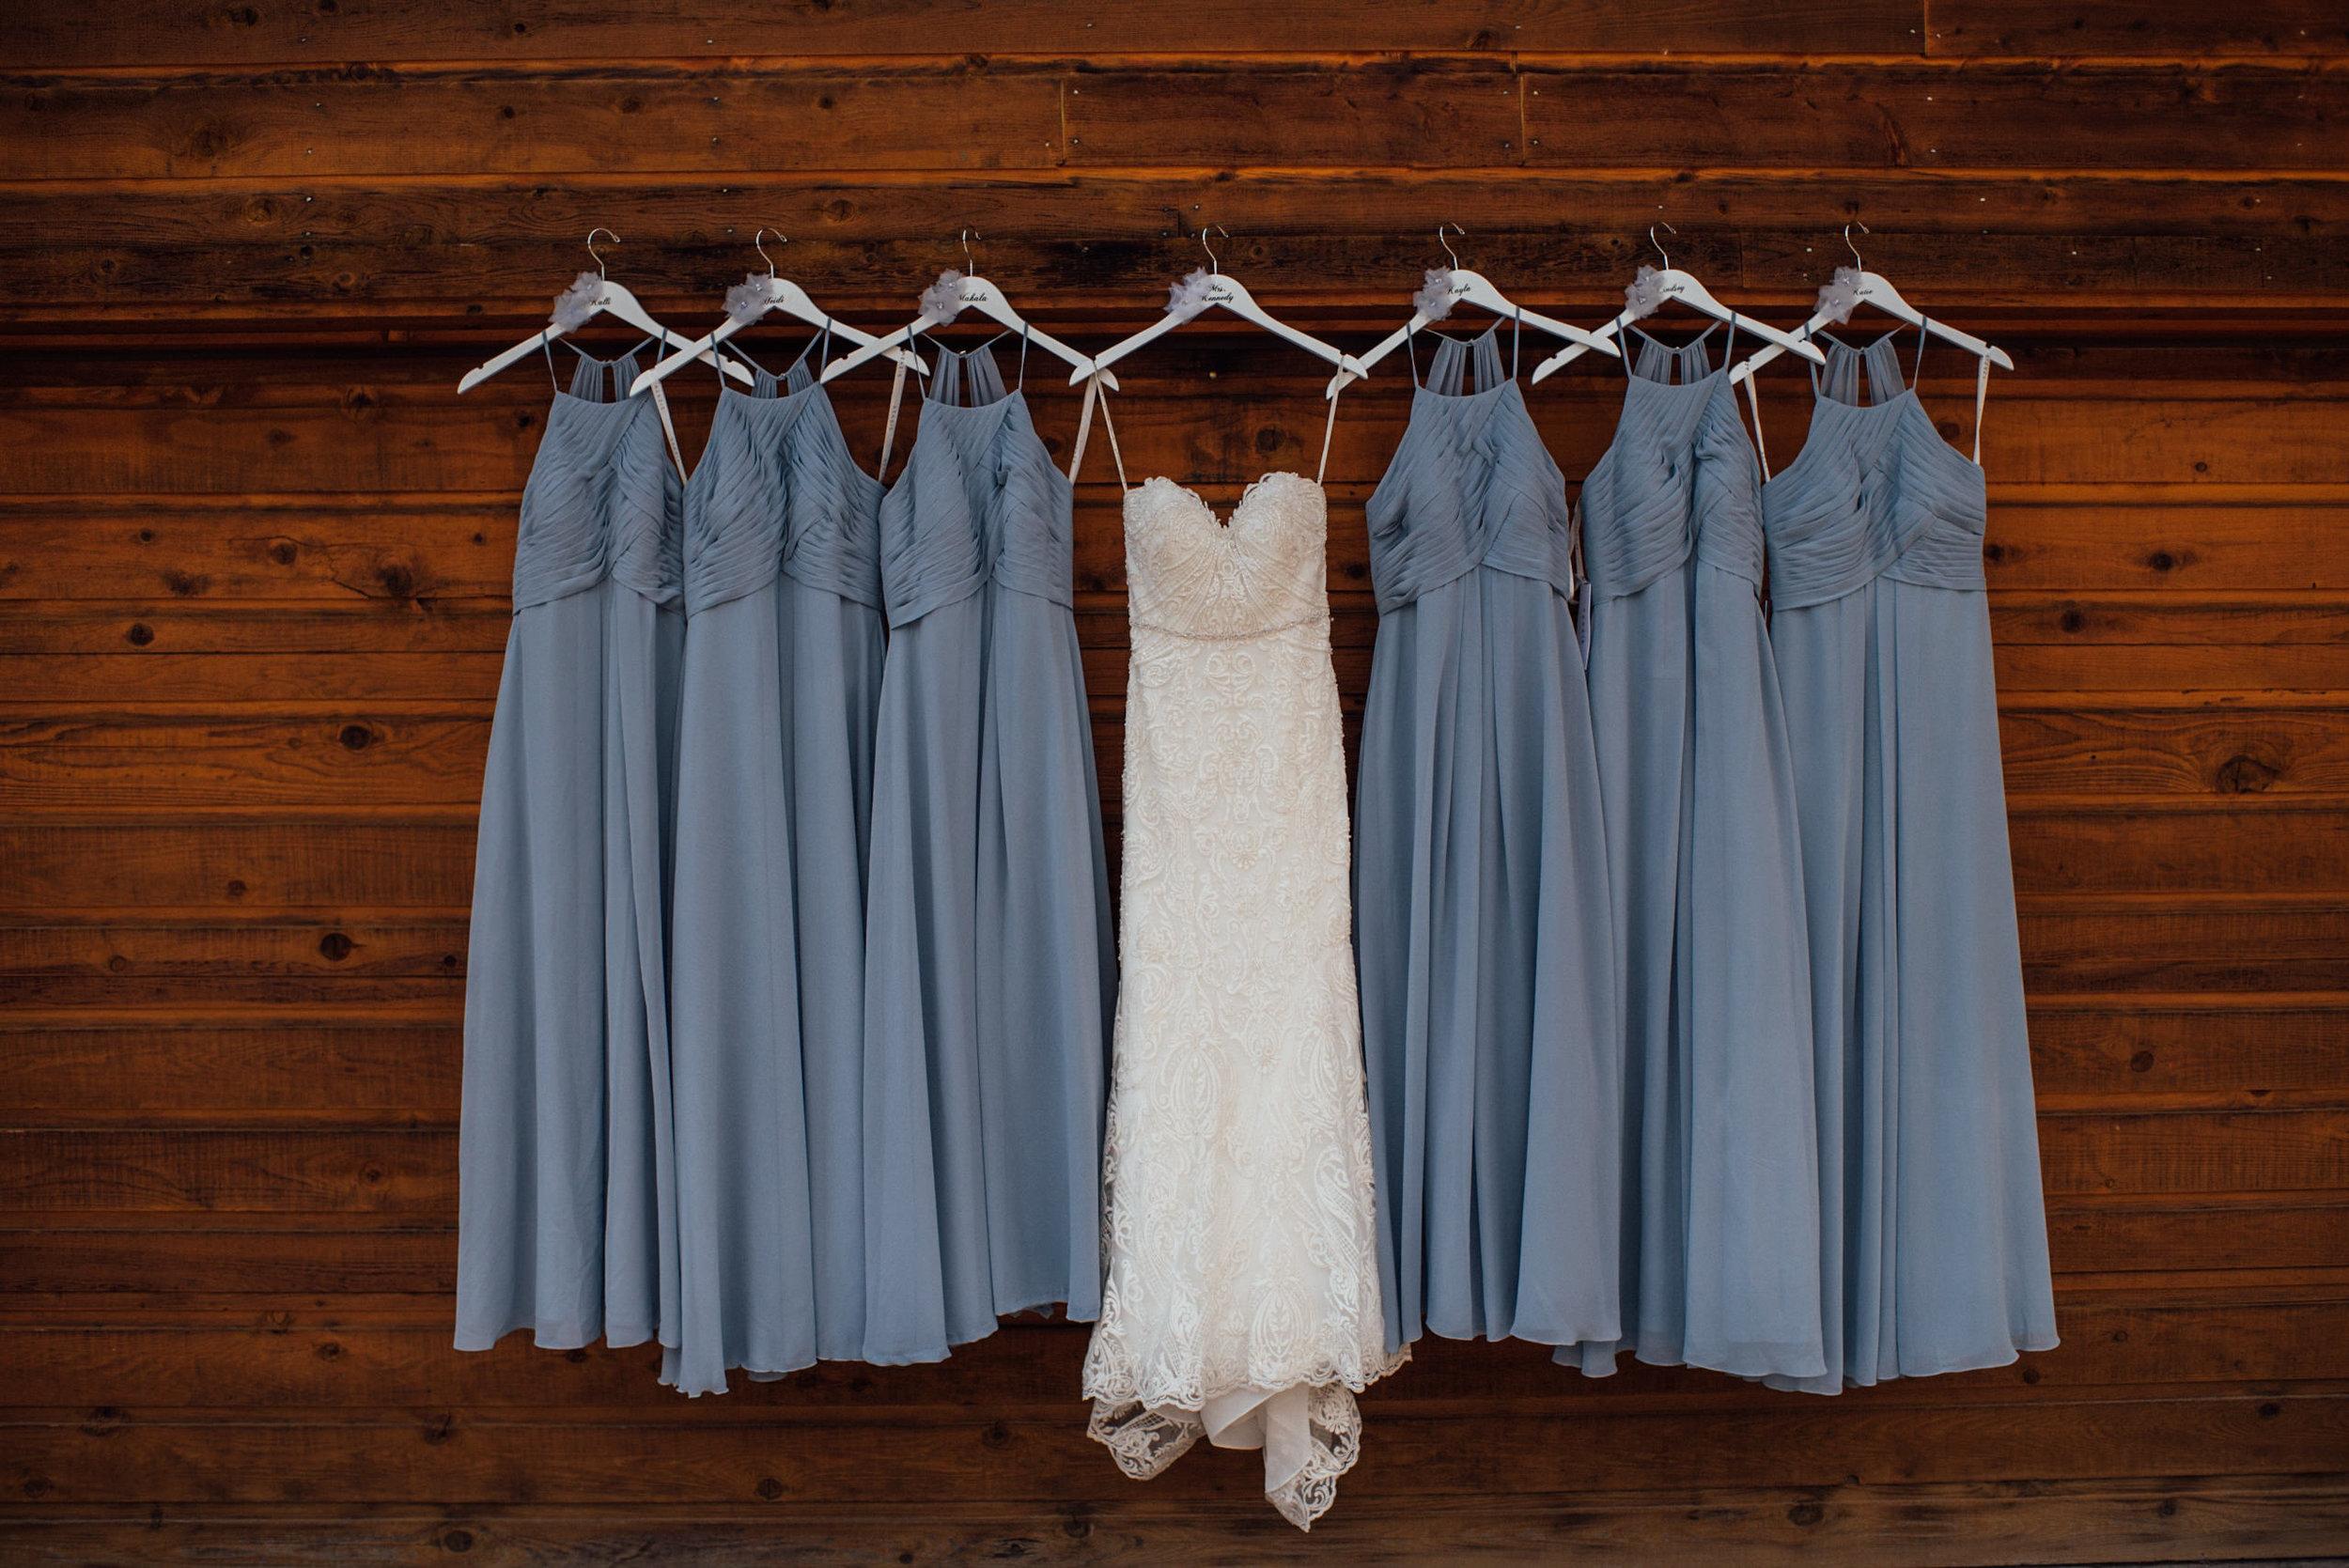 Bride and bridesmaid dress at Keystone, Colorado mountain wedding